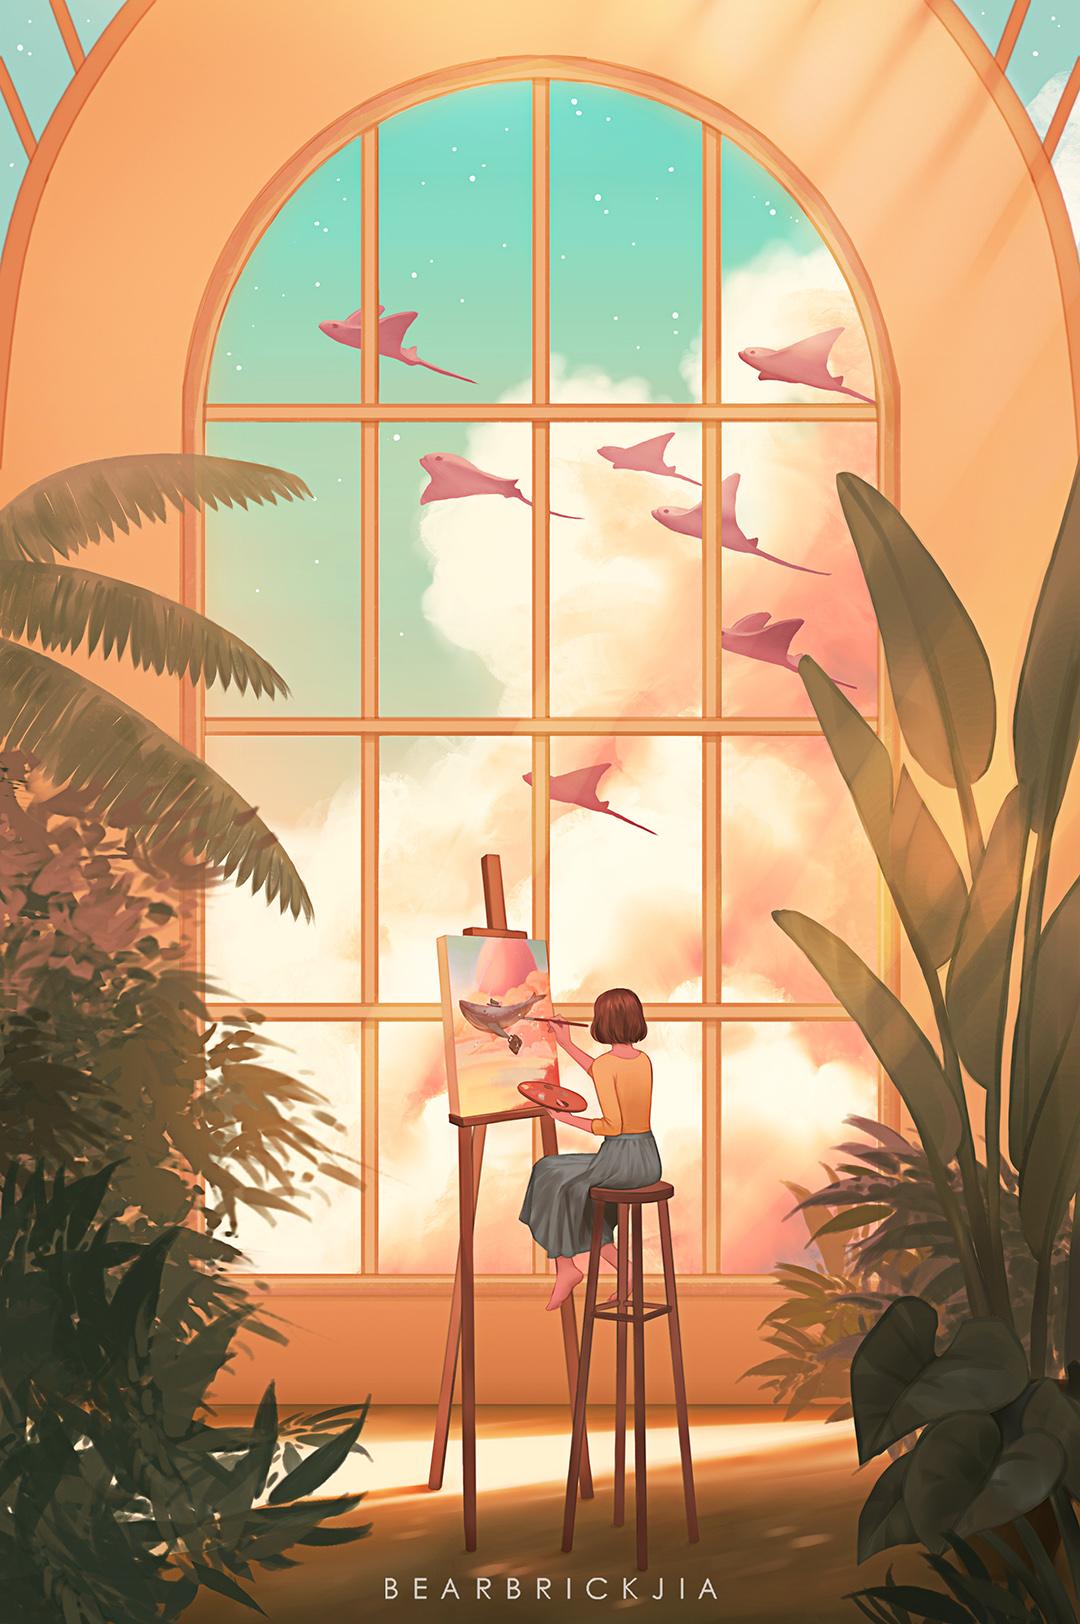 GirlsclubAsia-Artist-Illustrator-Karmen Loh-DreamStudio